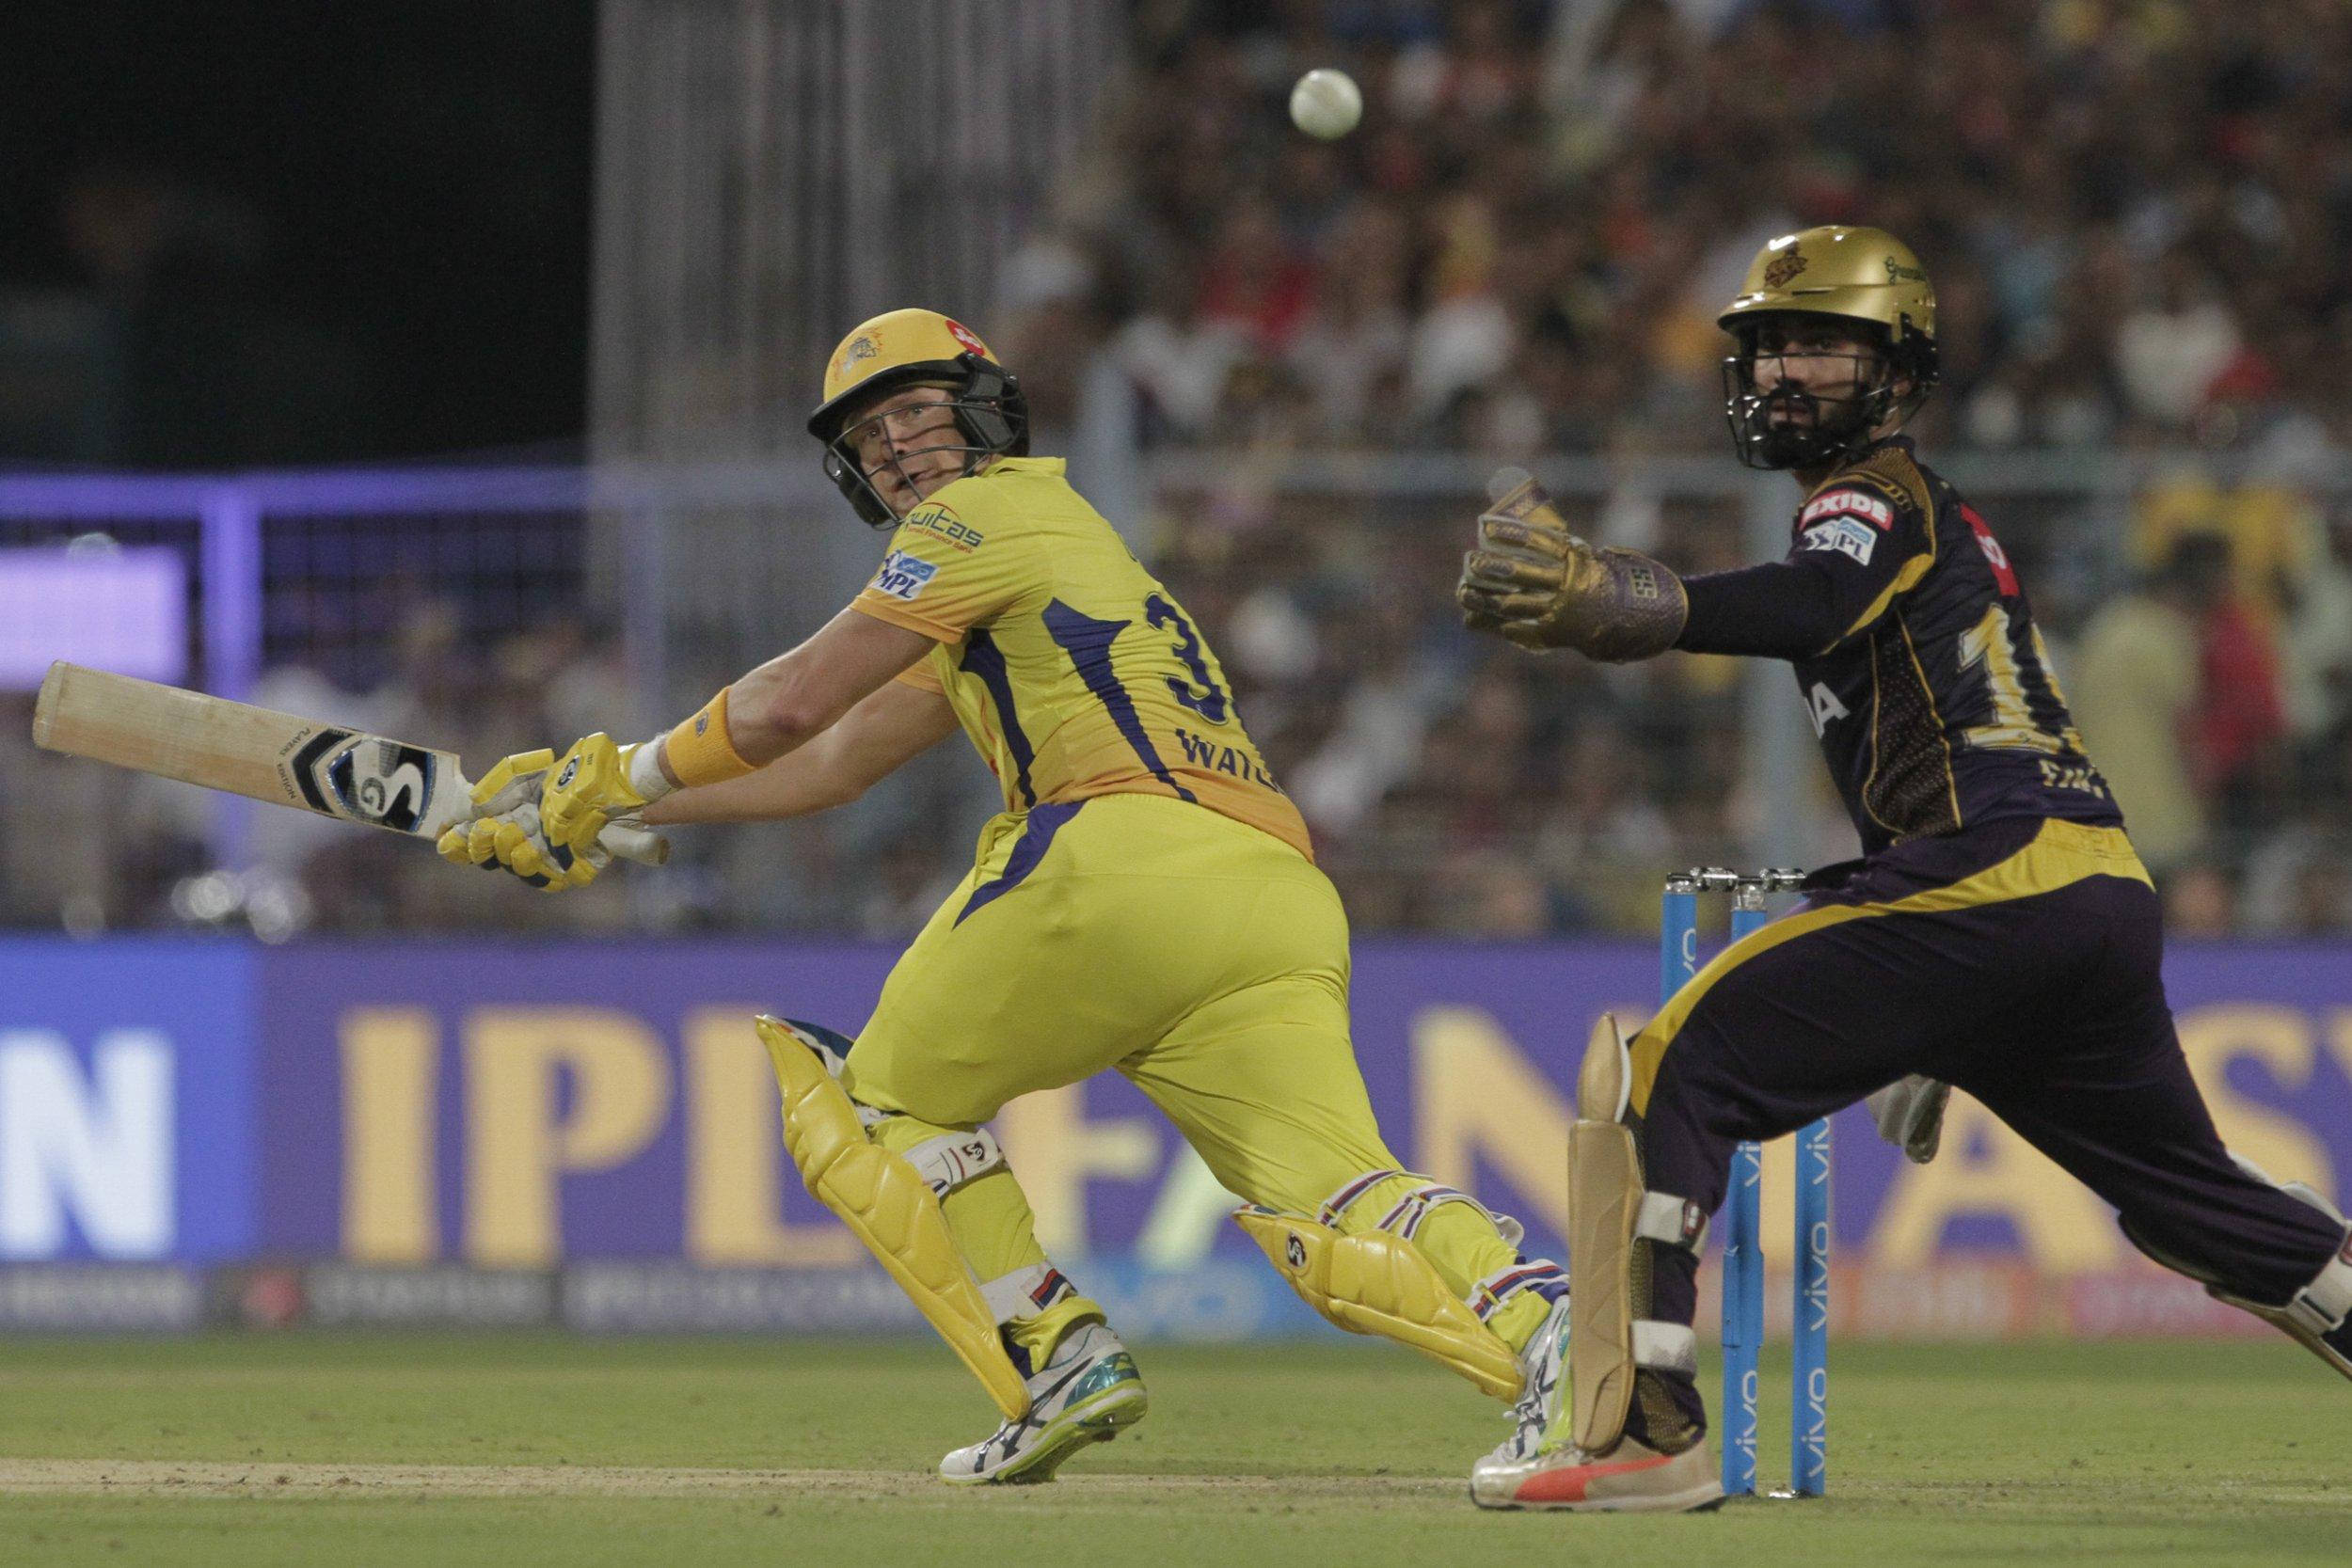 Delhi Daredevils v Chennai Super Kings betting preview: MS Dhoni, Suresh Raina and Shane Watson proving their doubters wrong